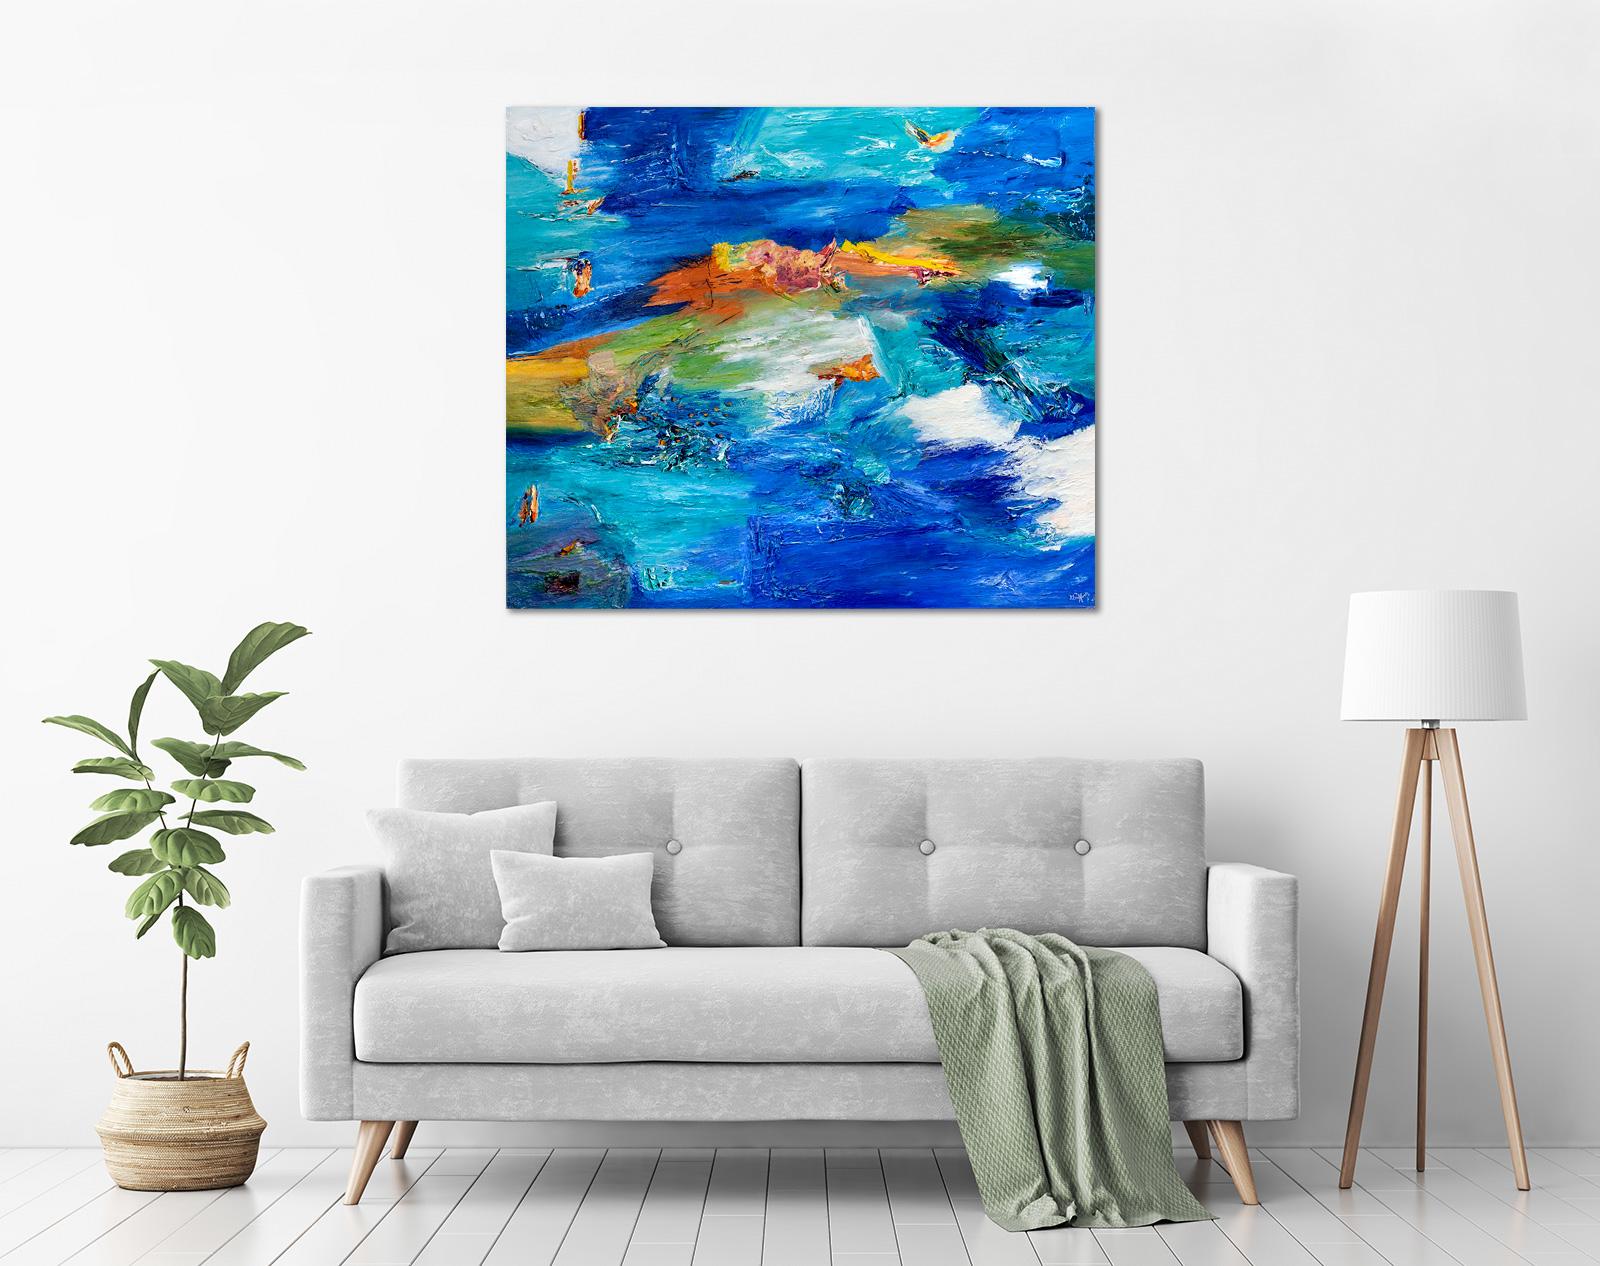 Ida Ernhardt - 'Unique Ocean Connection' in a room